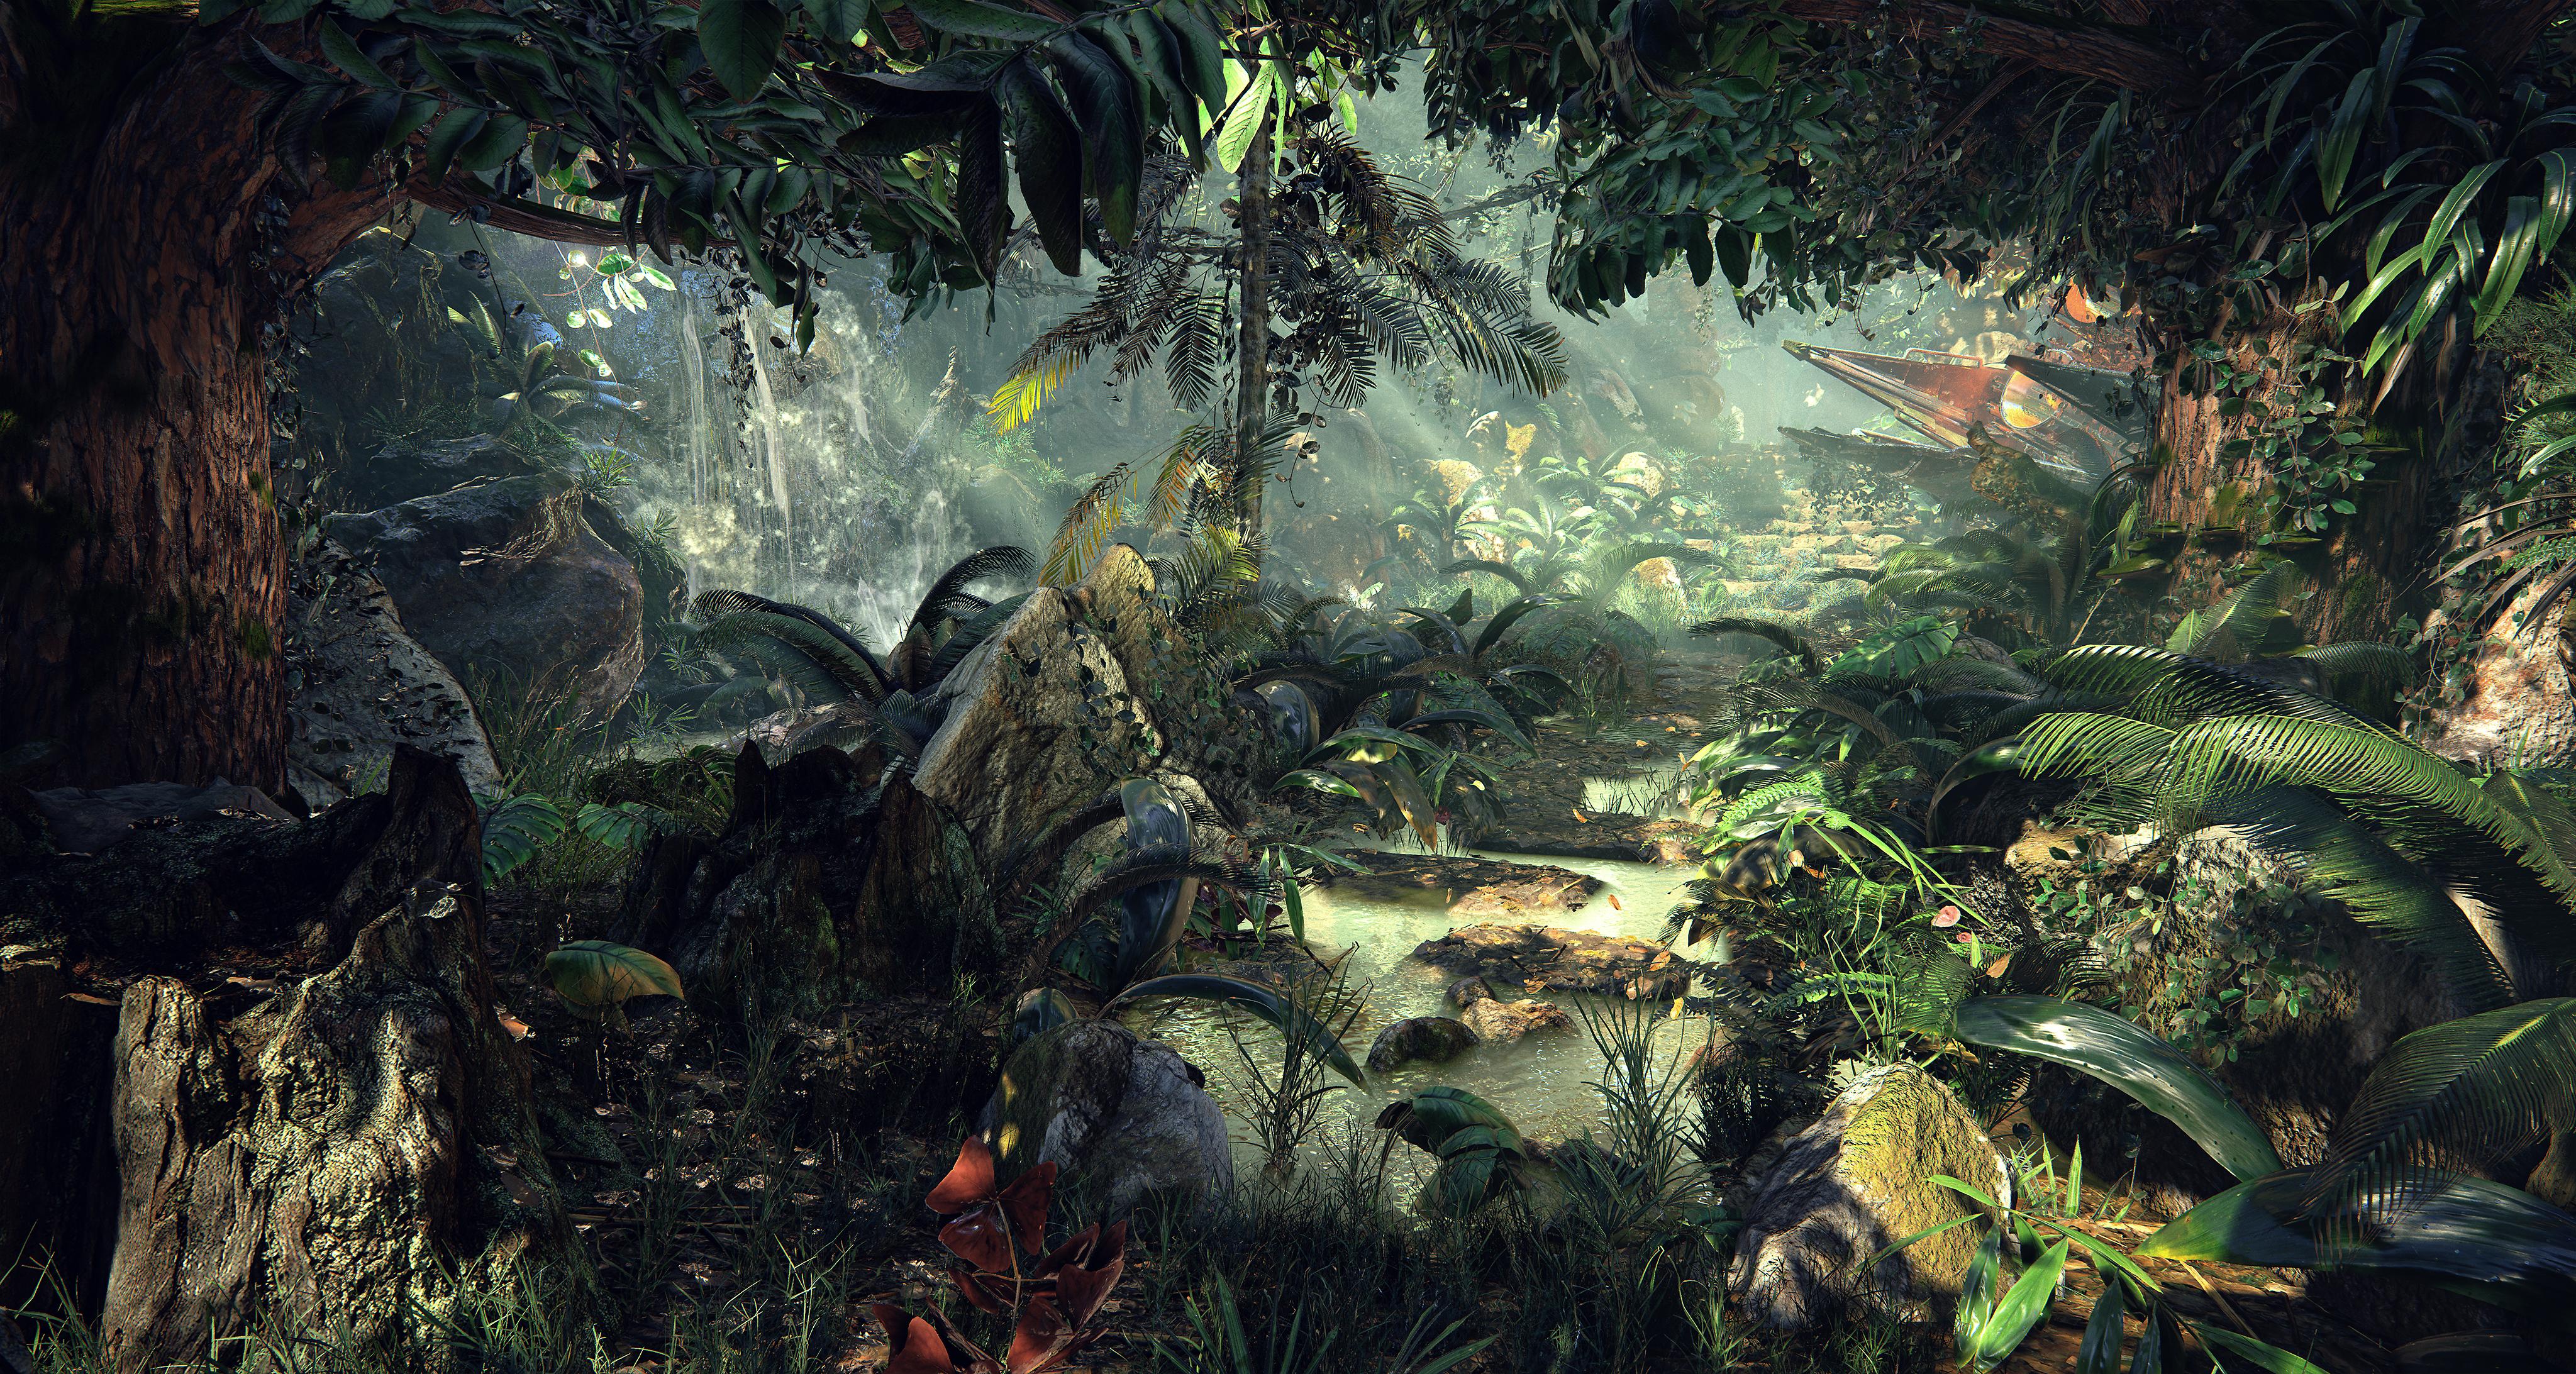 Unreal Engine 4 download Unreal-Engine-4-Quixel%E2%80%99s-Jungle-Environment-1